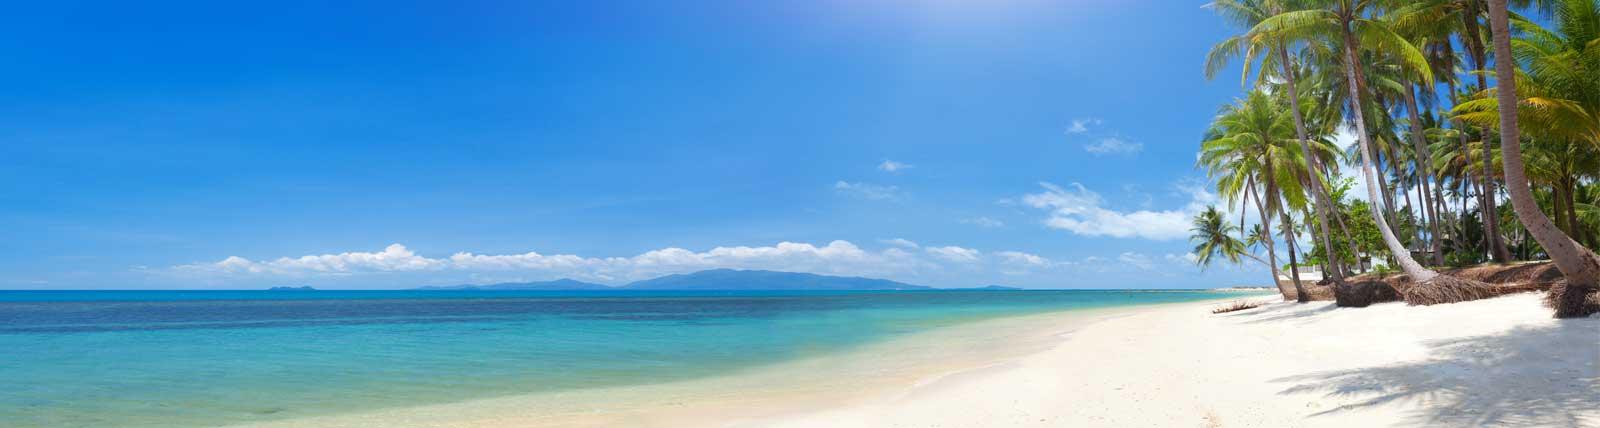 Ferienwohnung Mauritius